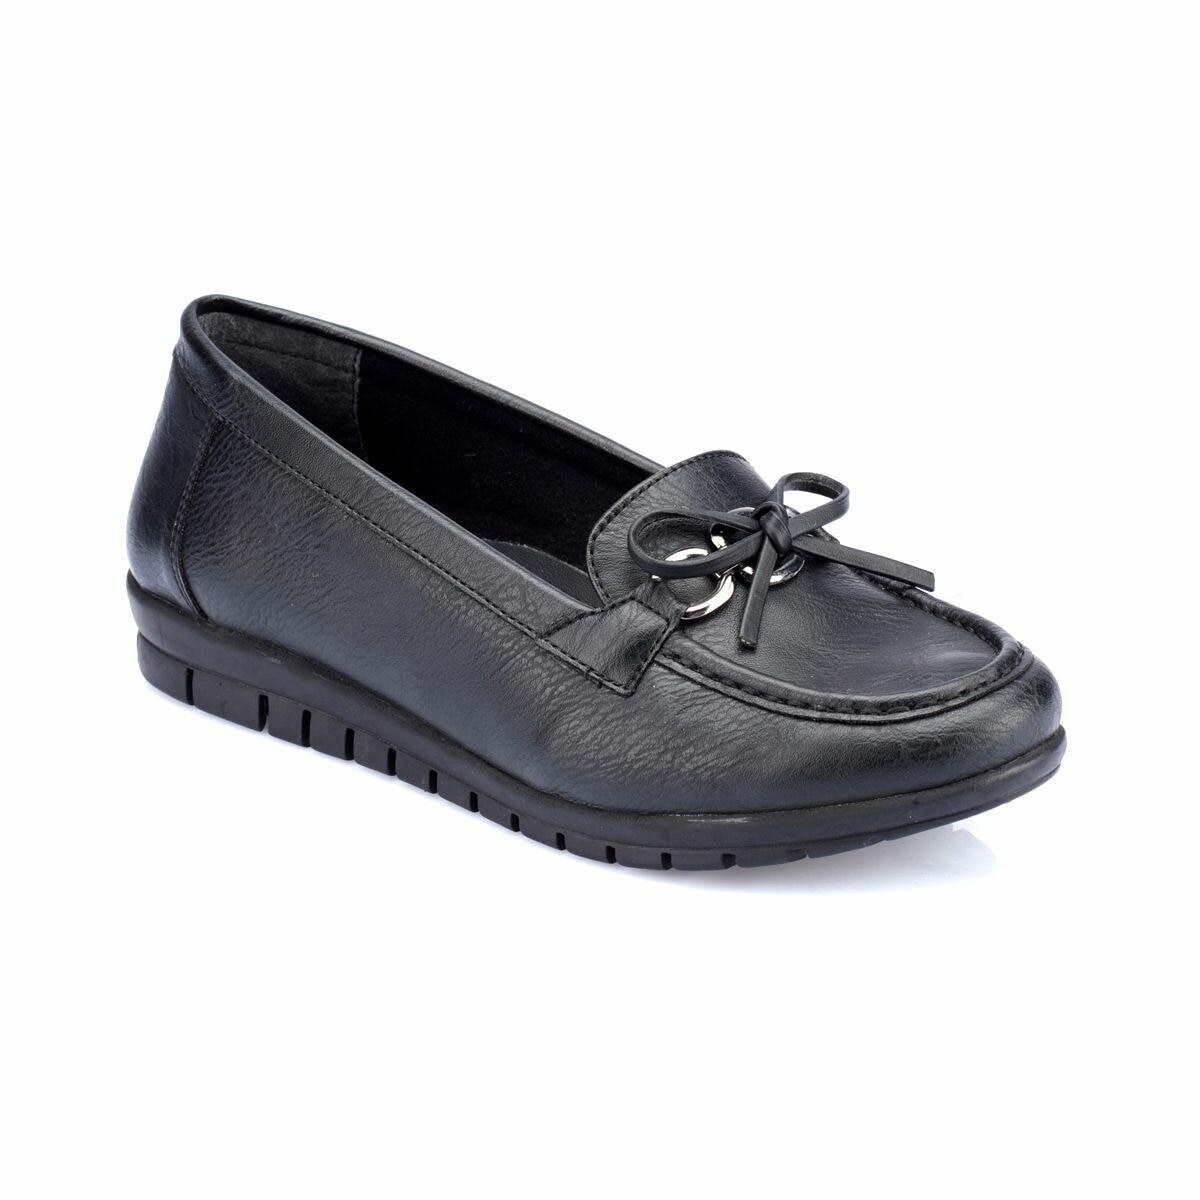 FLO 82. 156915.Z Black Women Shoes Polaris